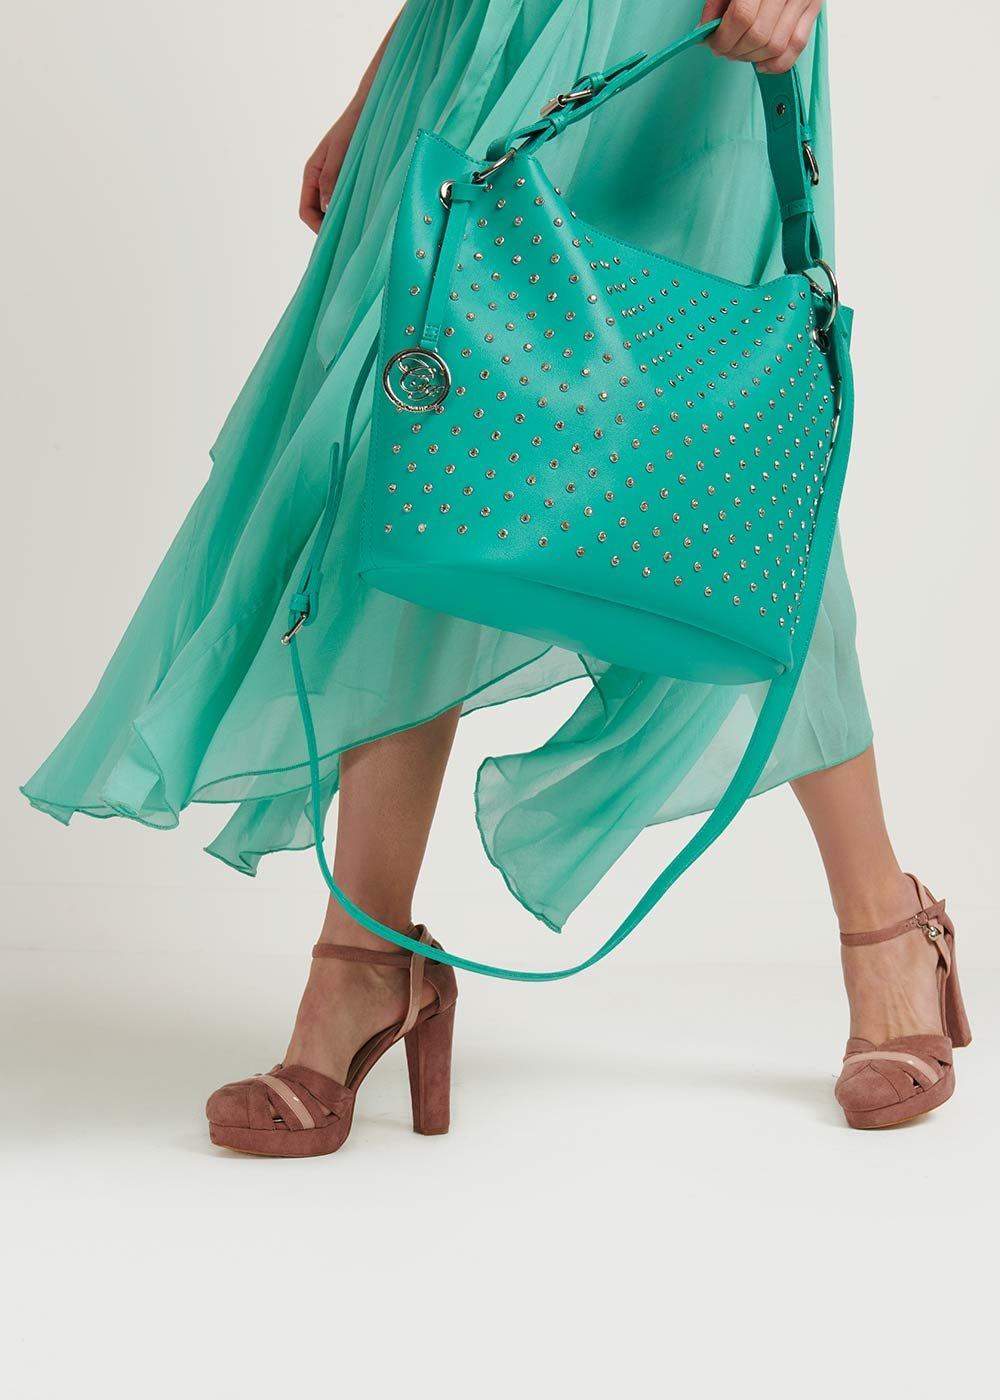 Badly bag with rhinestones - Emerald - Woman